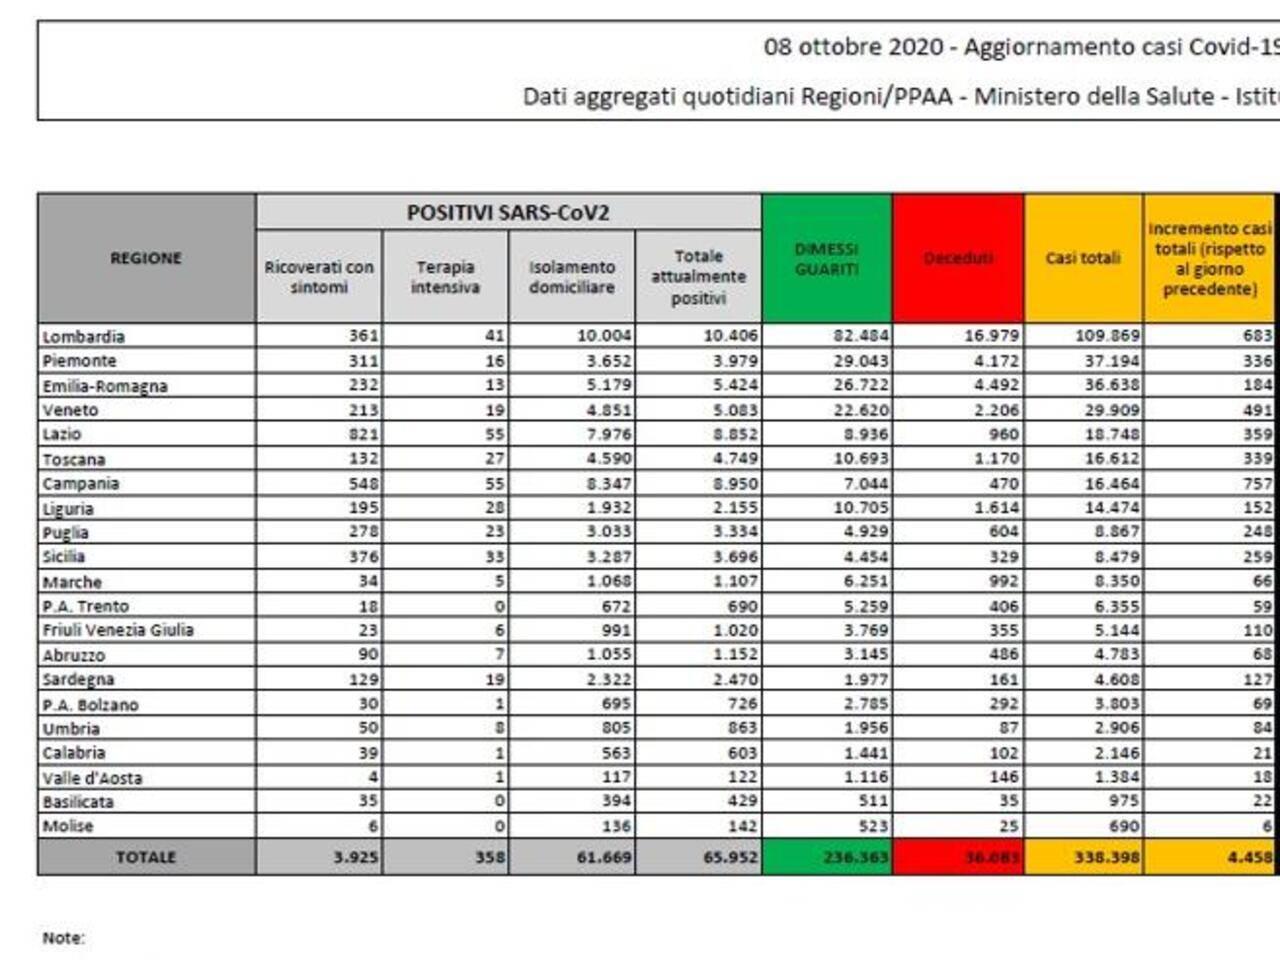 Coronavirus, tornano a salire i nuovi casi registrati in Italia: oggi 4.458